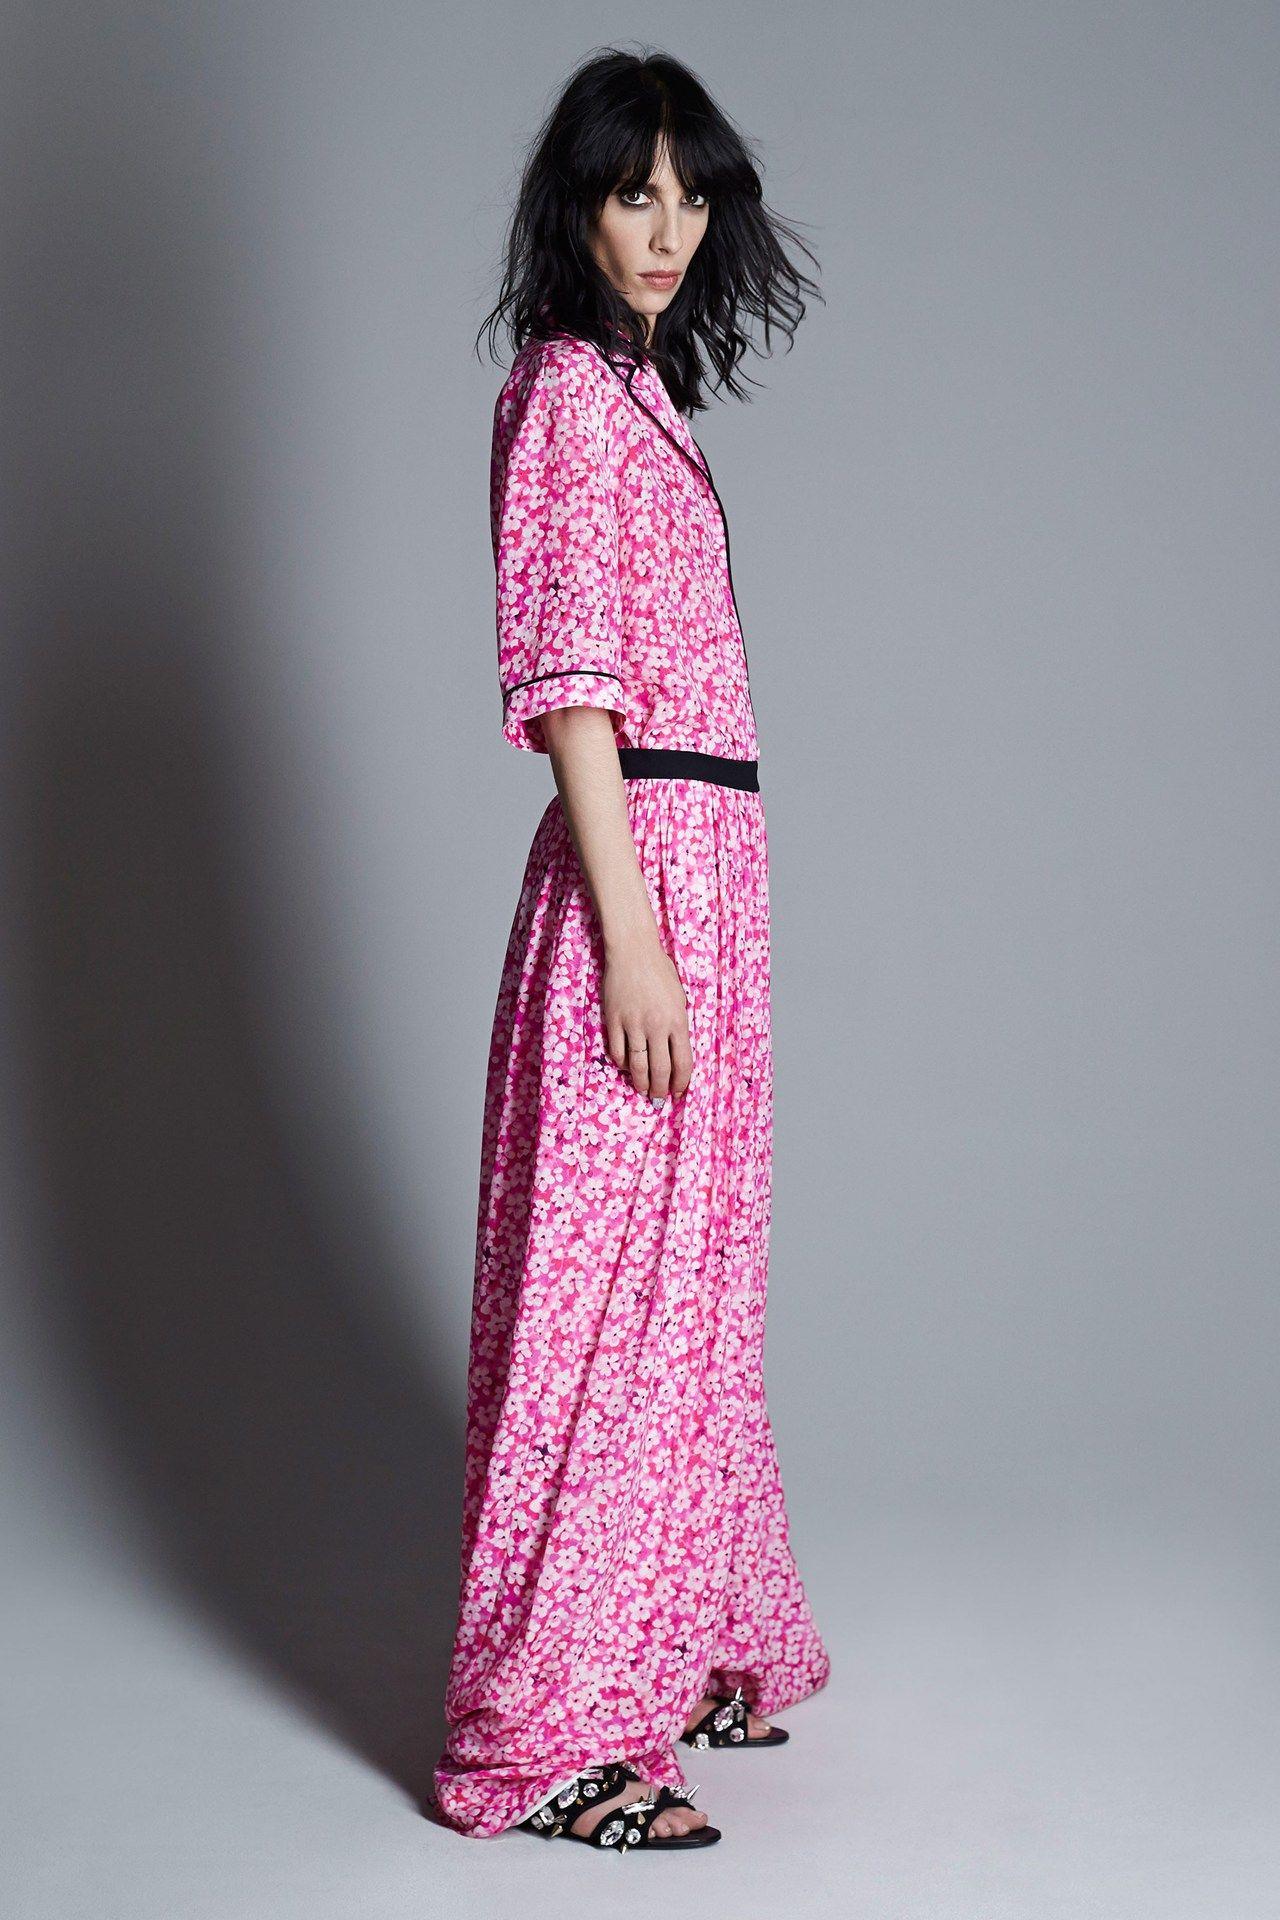 Emanuel Ungaro, pre-spring/summer 2015 fashion collection